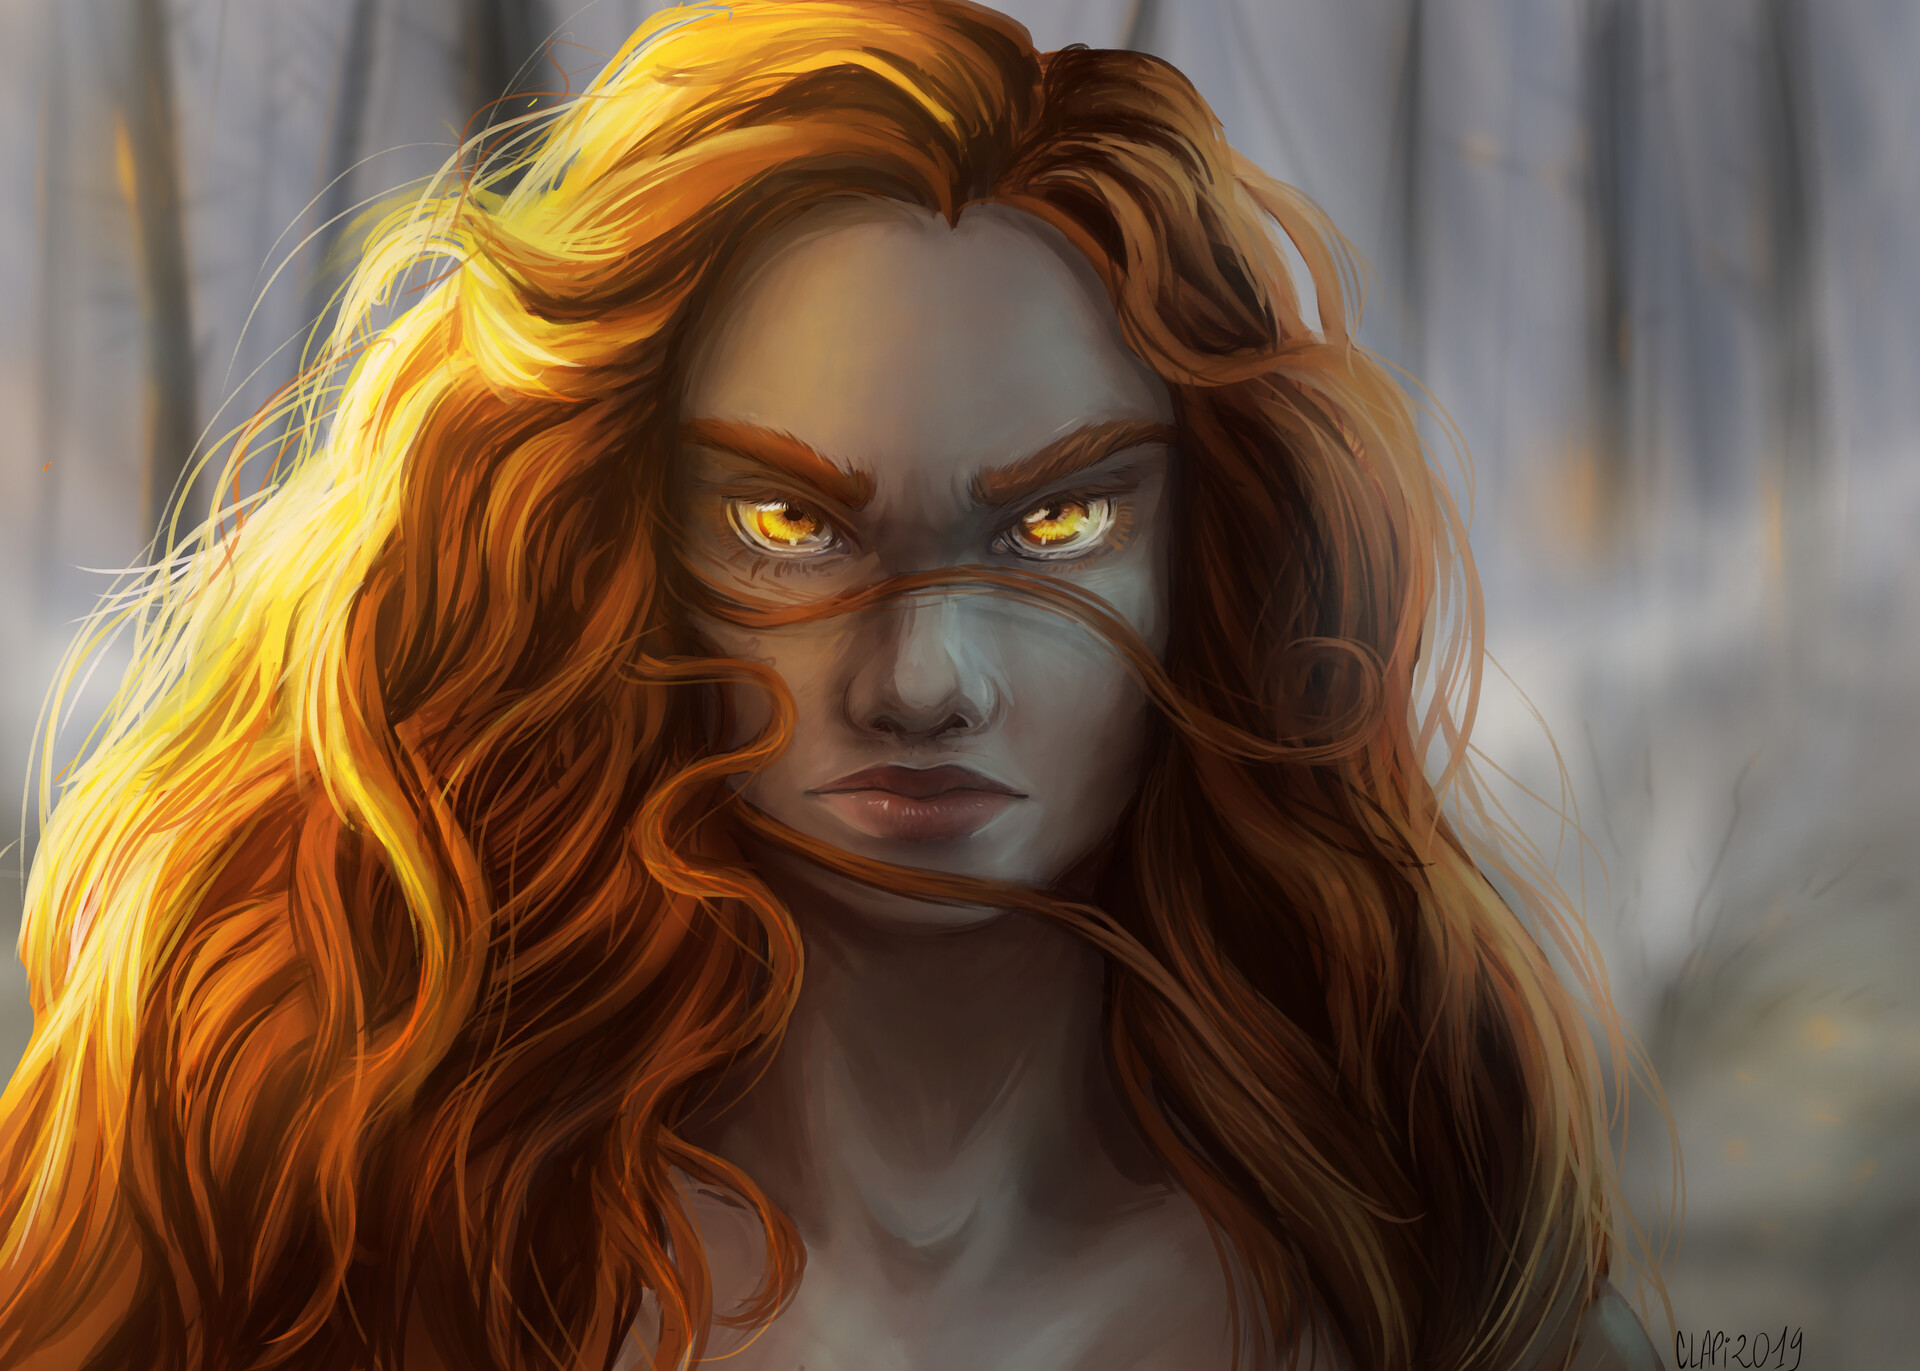 Claudia pistritto golden eyes 2 wip4